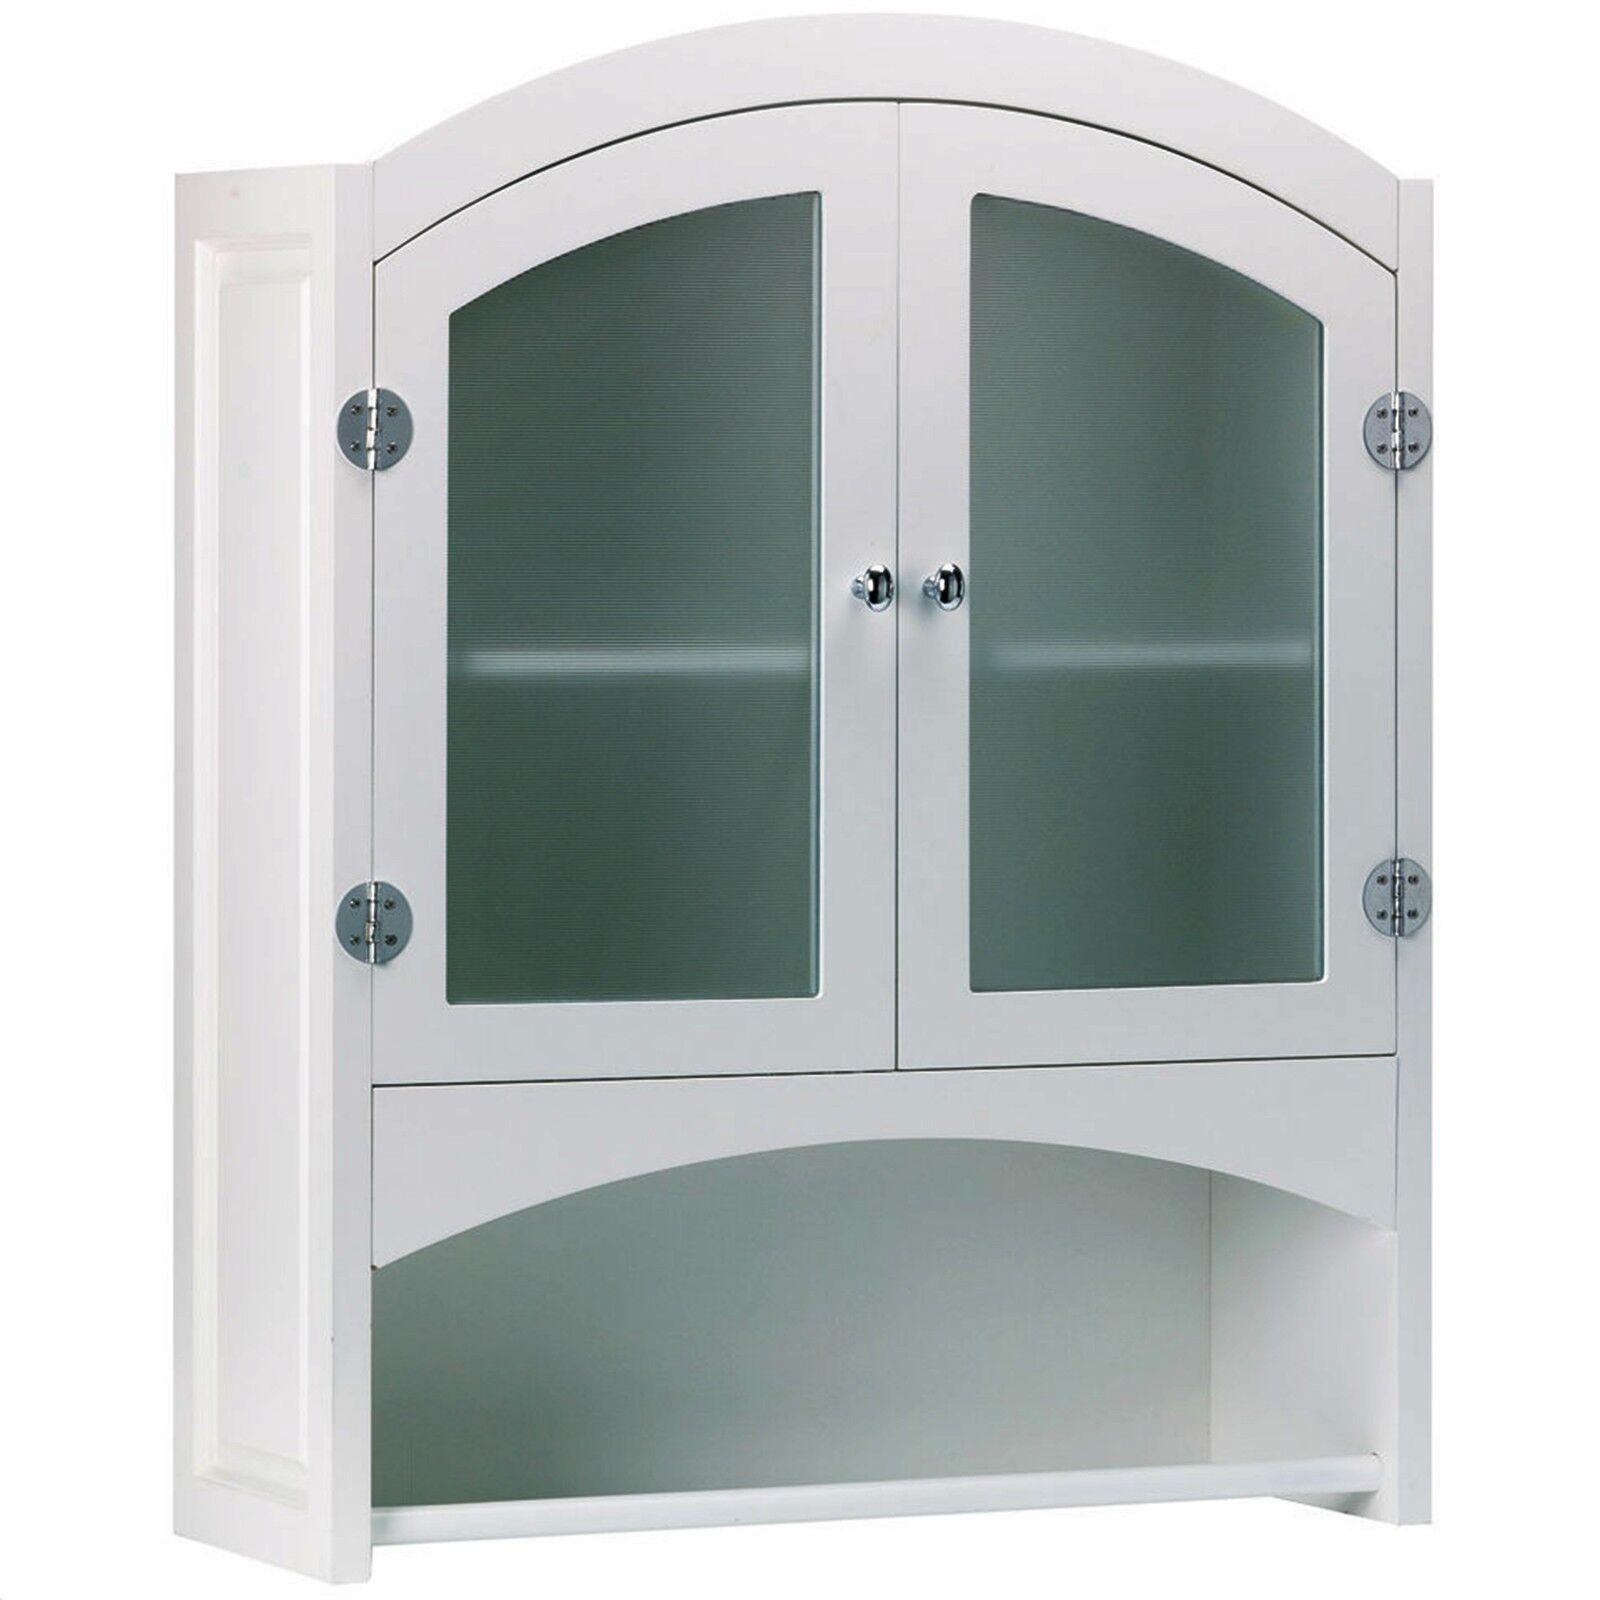 Wood Wall Cabinet White Capboard Kitchen Bathroom Storage Shelves Bath Towel Bar 718569027184 Ebay